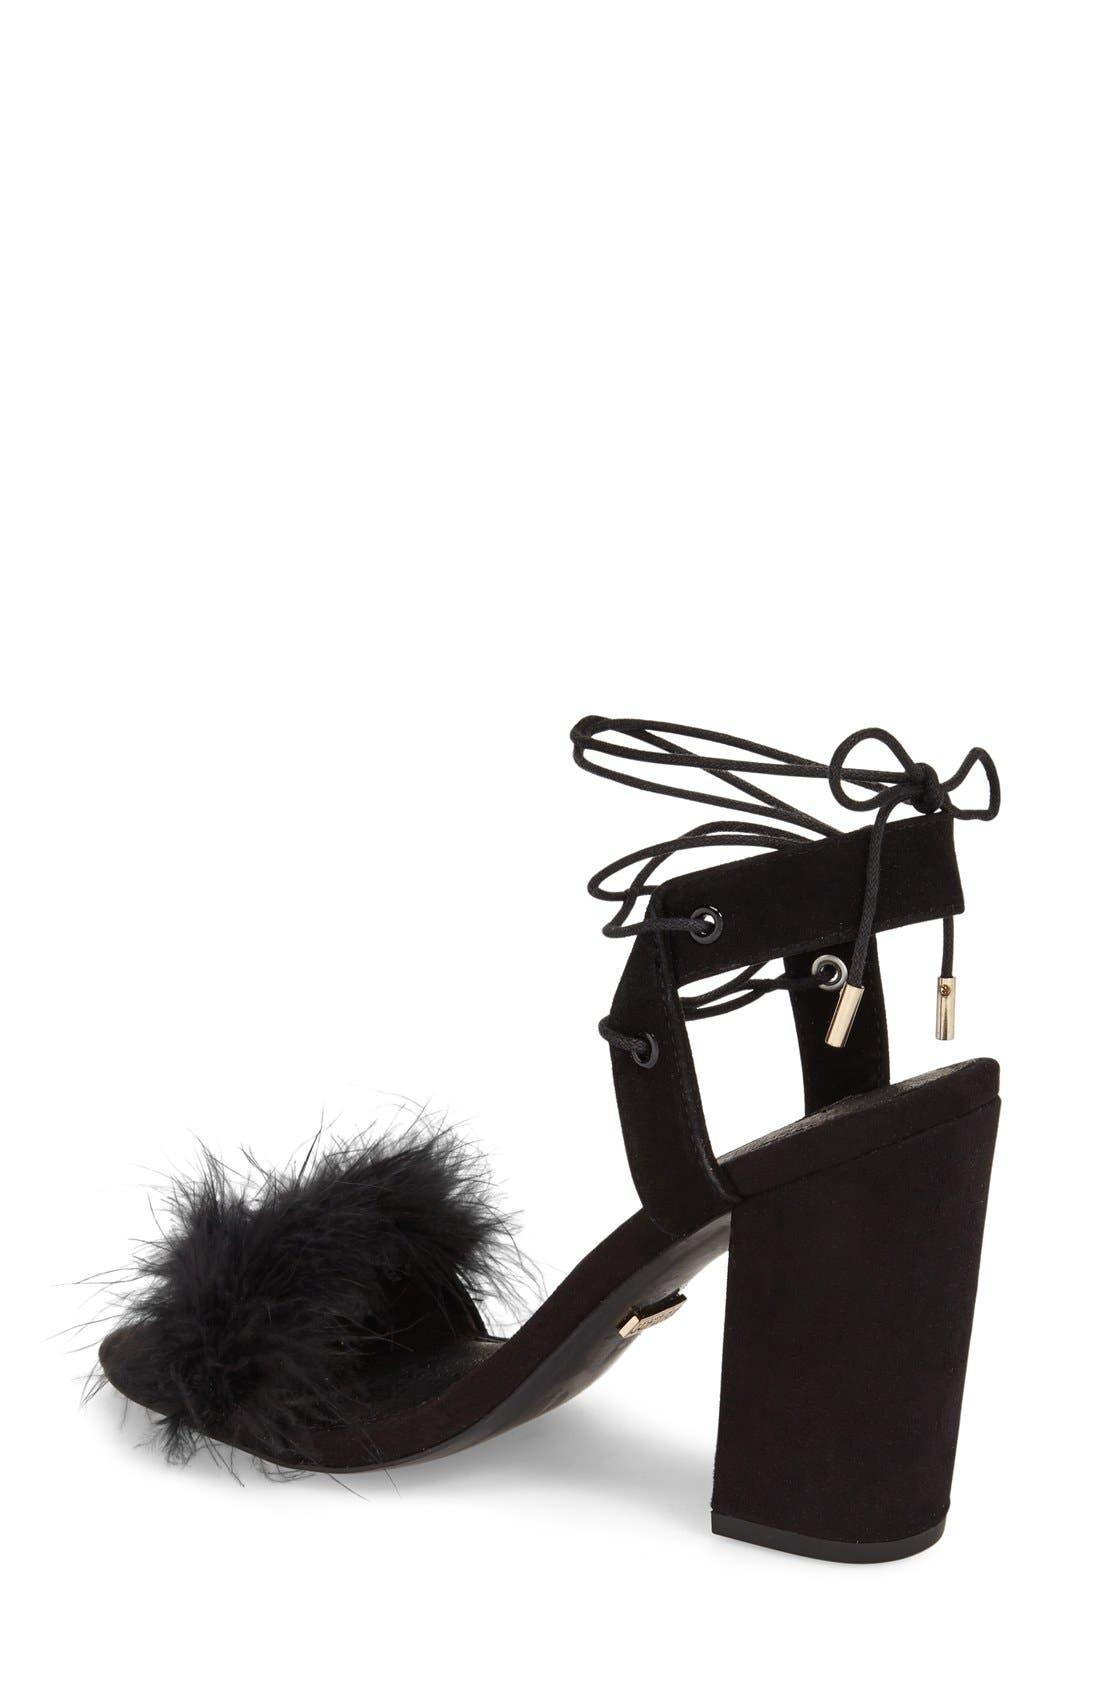 Marabou Feather Lace-Up Sandal,                             Alternate thumbnail 2, color,                             001